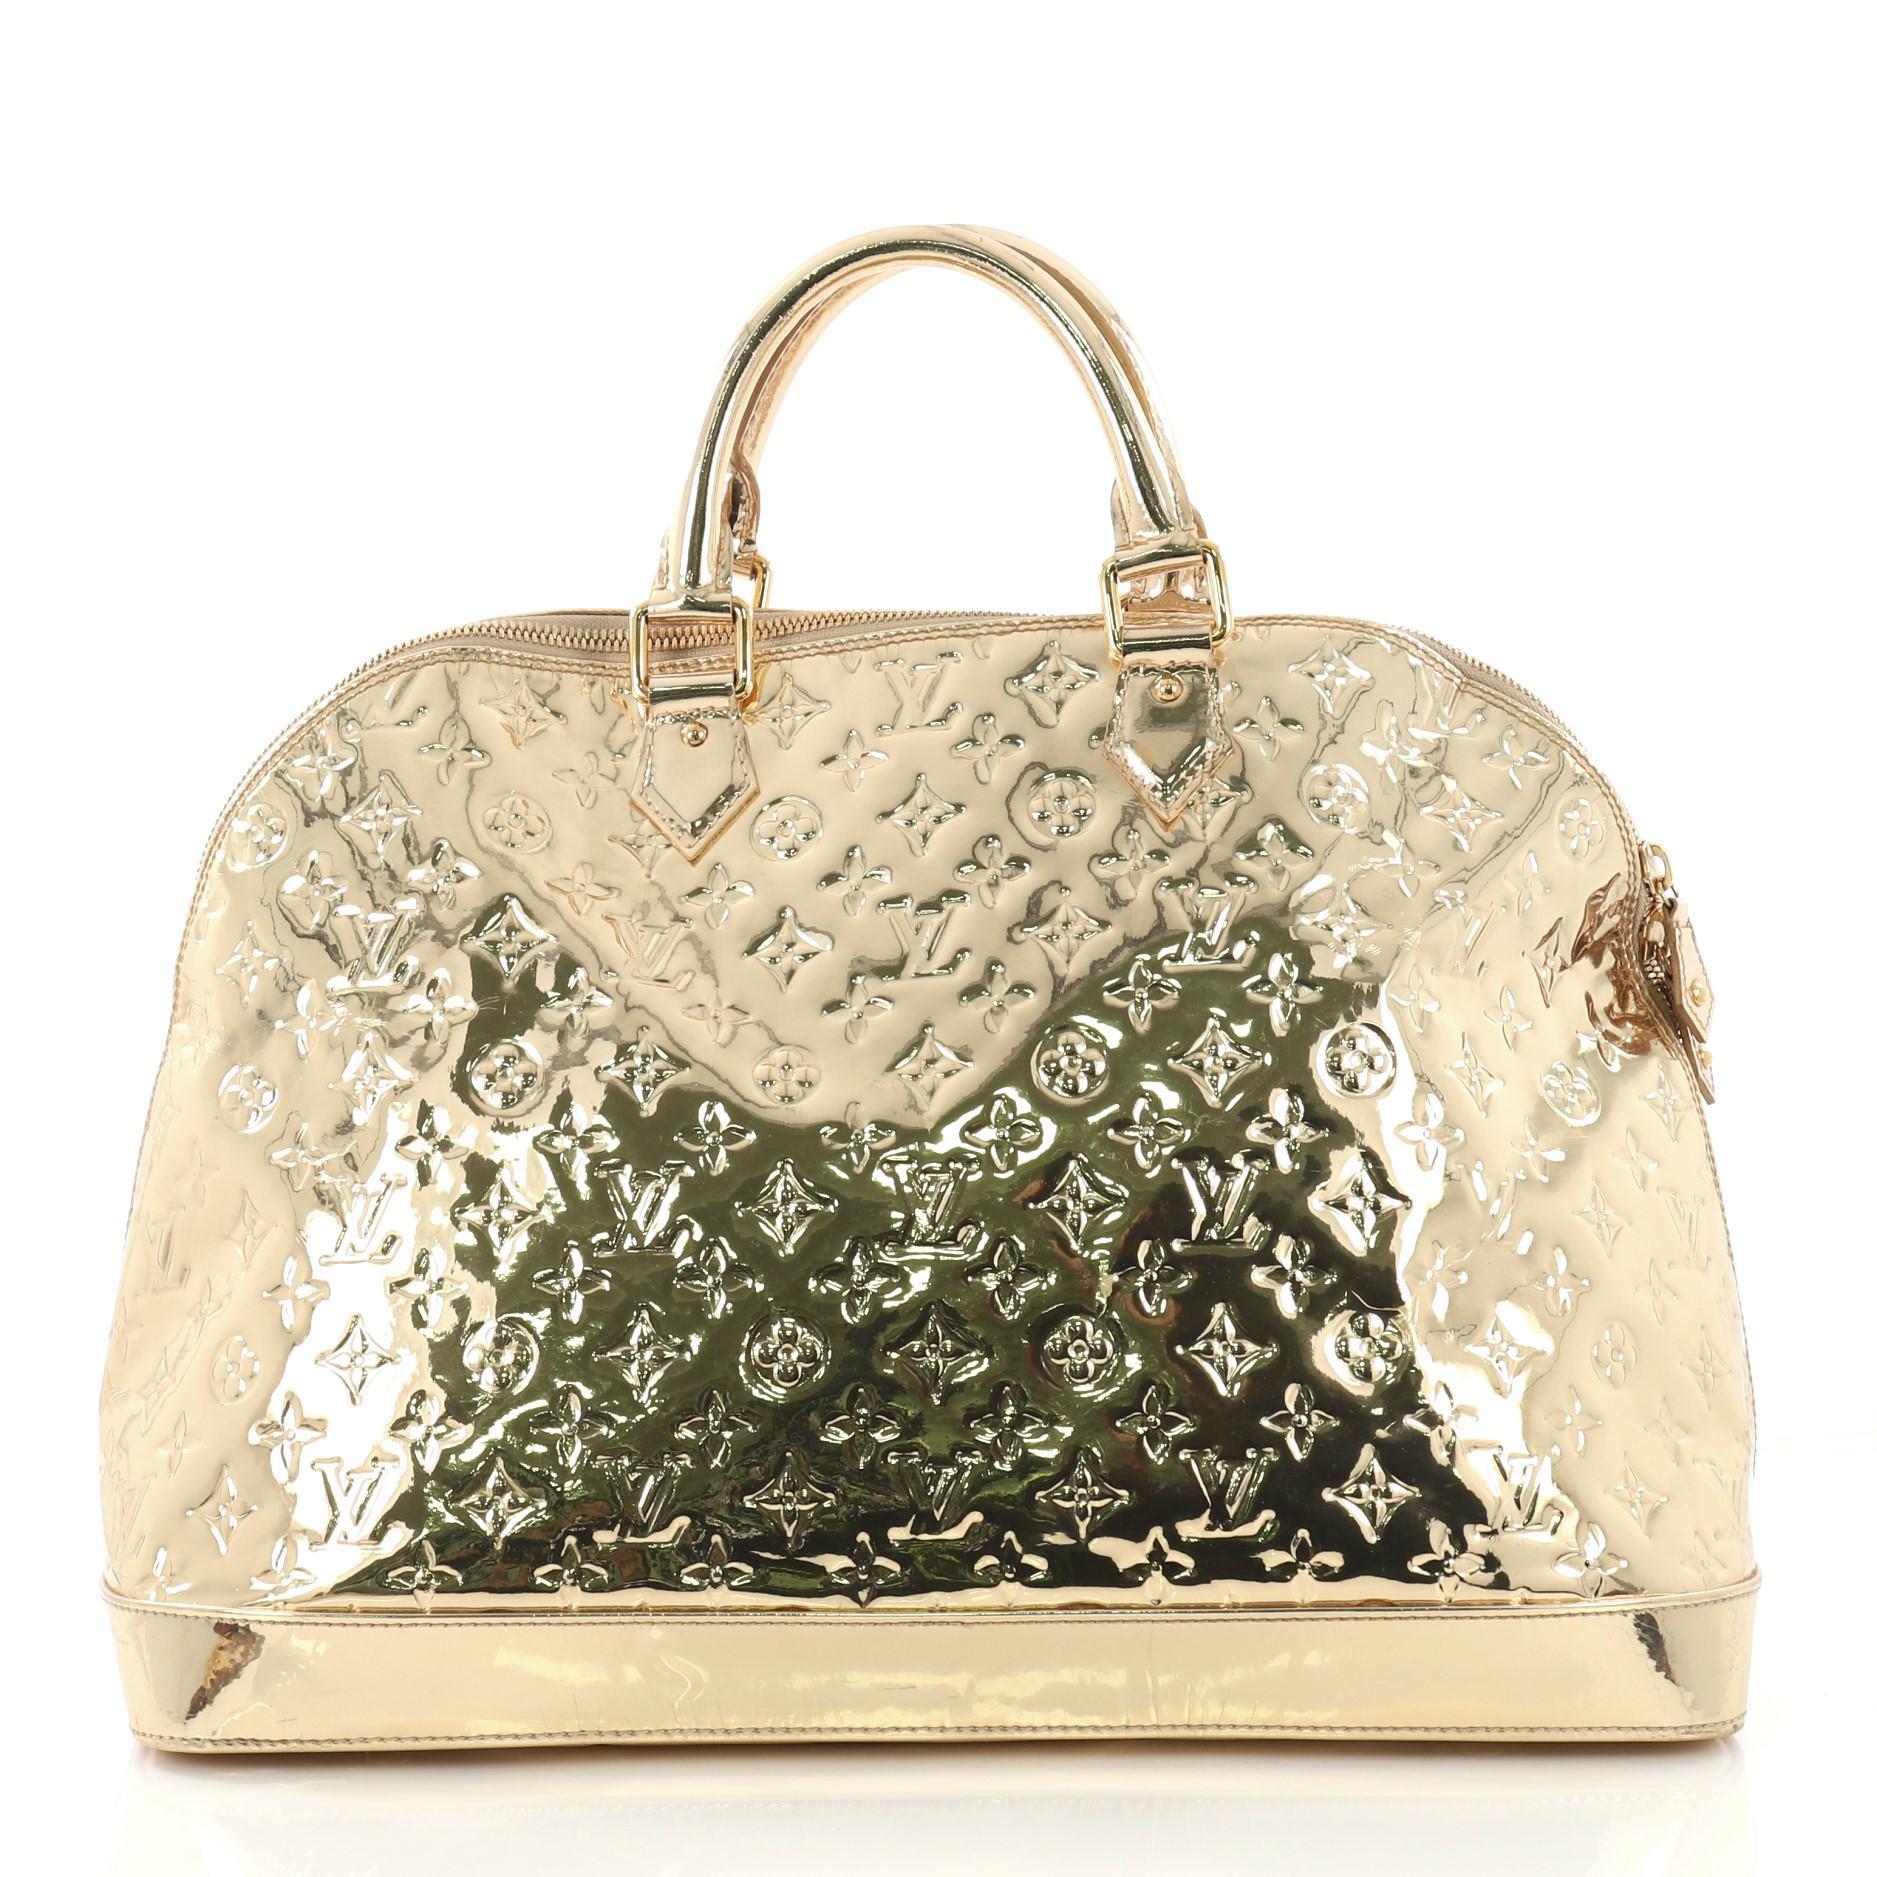 227c45706b51 Louis Vuitton Alma Handbag Miroir PVC XL at 1stdibs